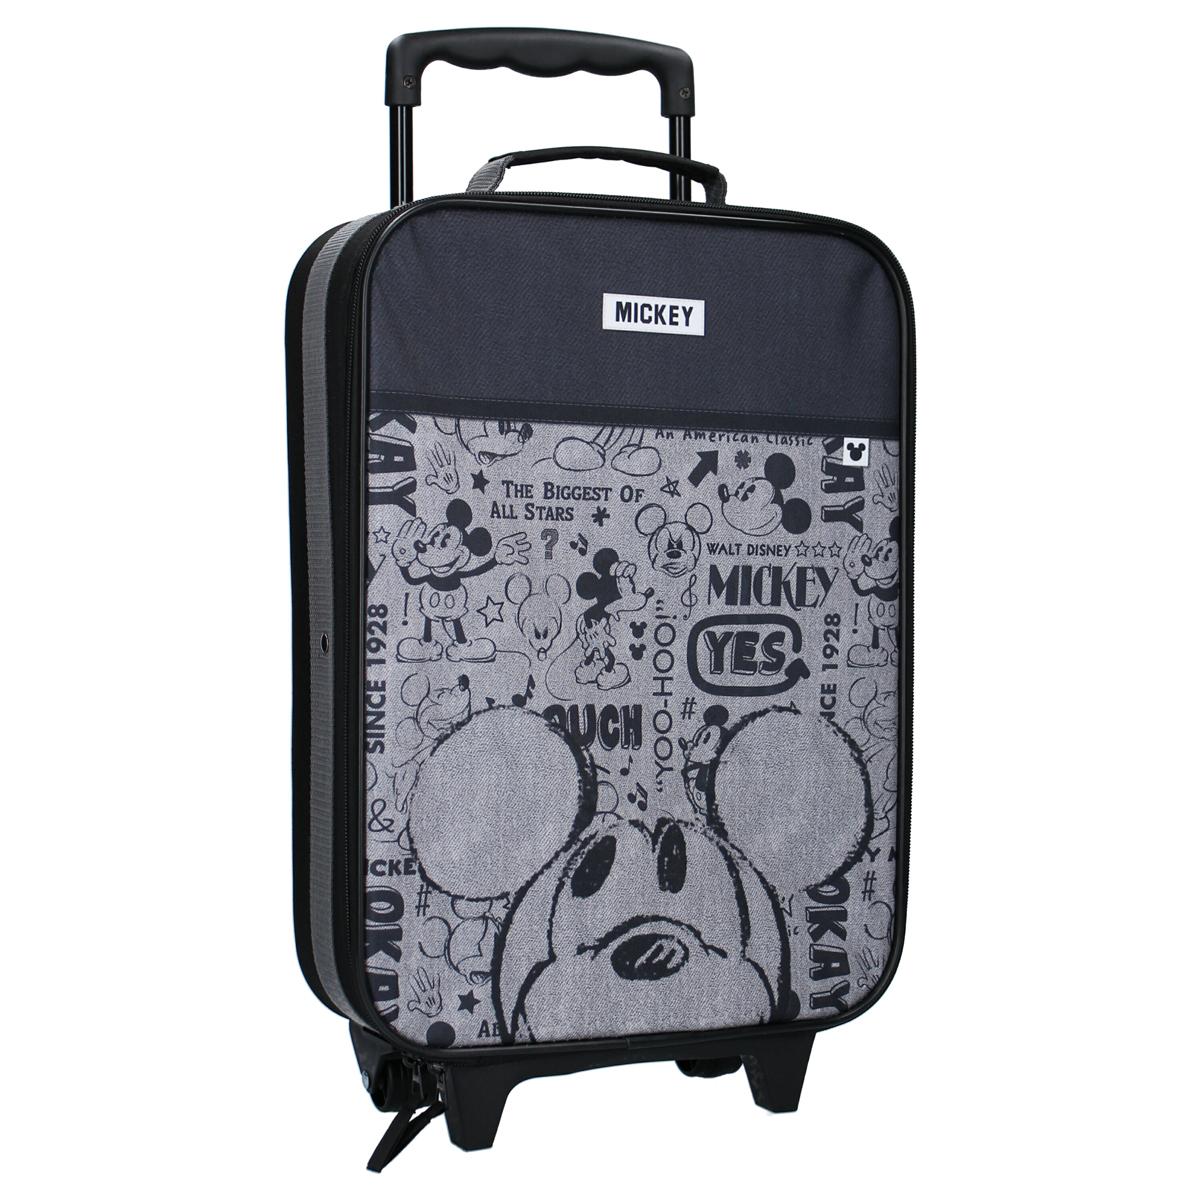 Valise trolley \'Mickey\' noir gris - 40x30x14 cm - [A0131]